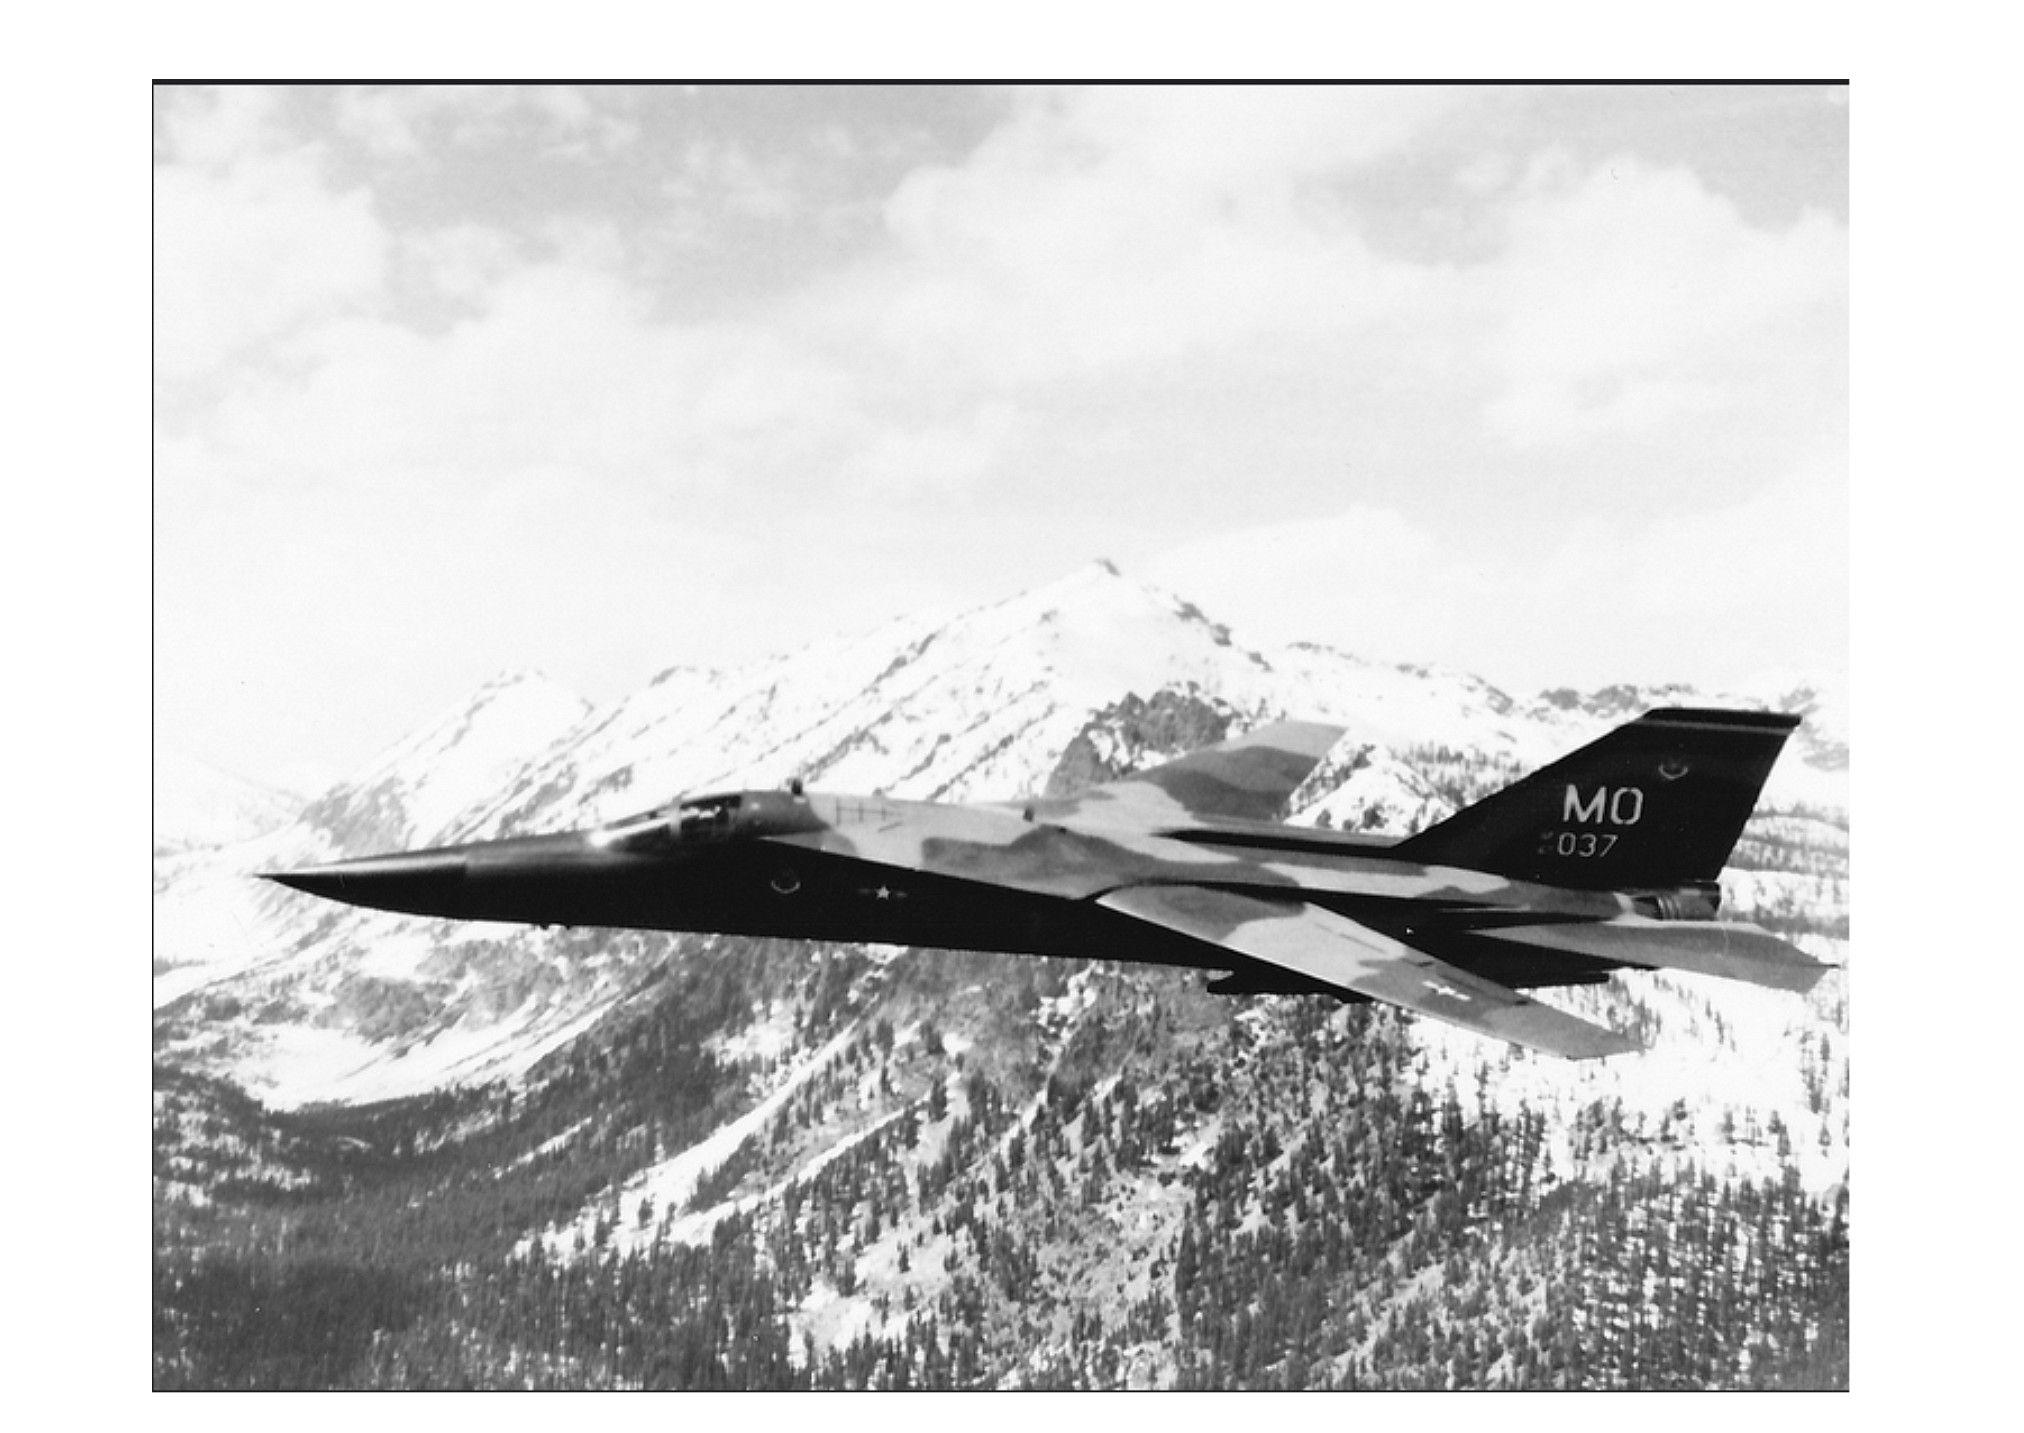 389FS F-111A over Sawtooth Mountains, Idaho